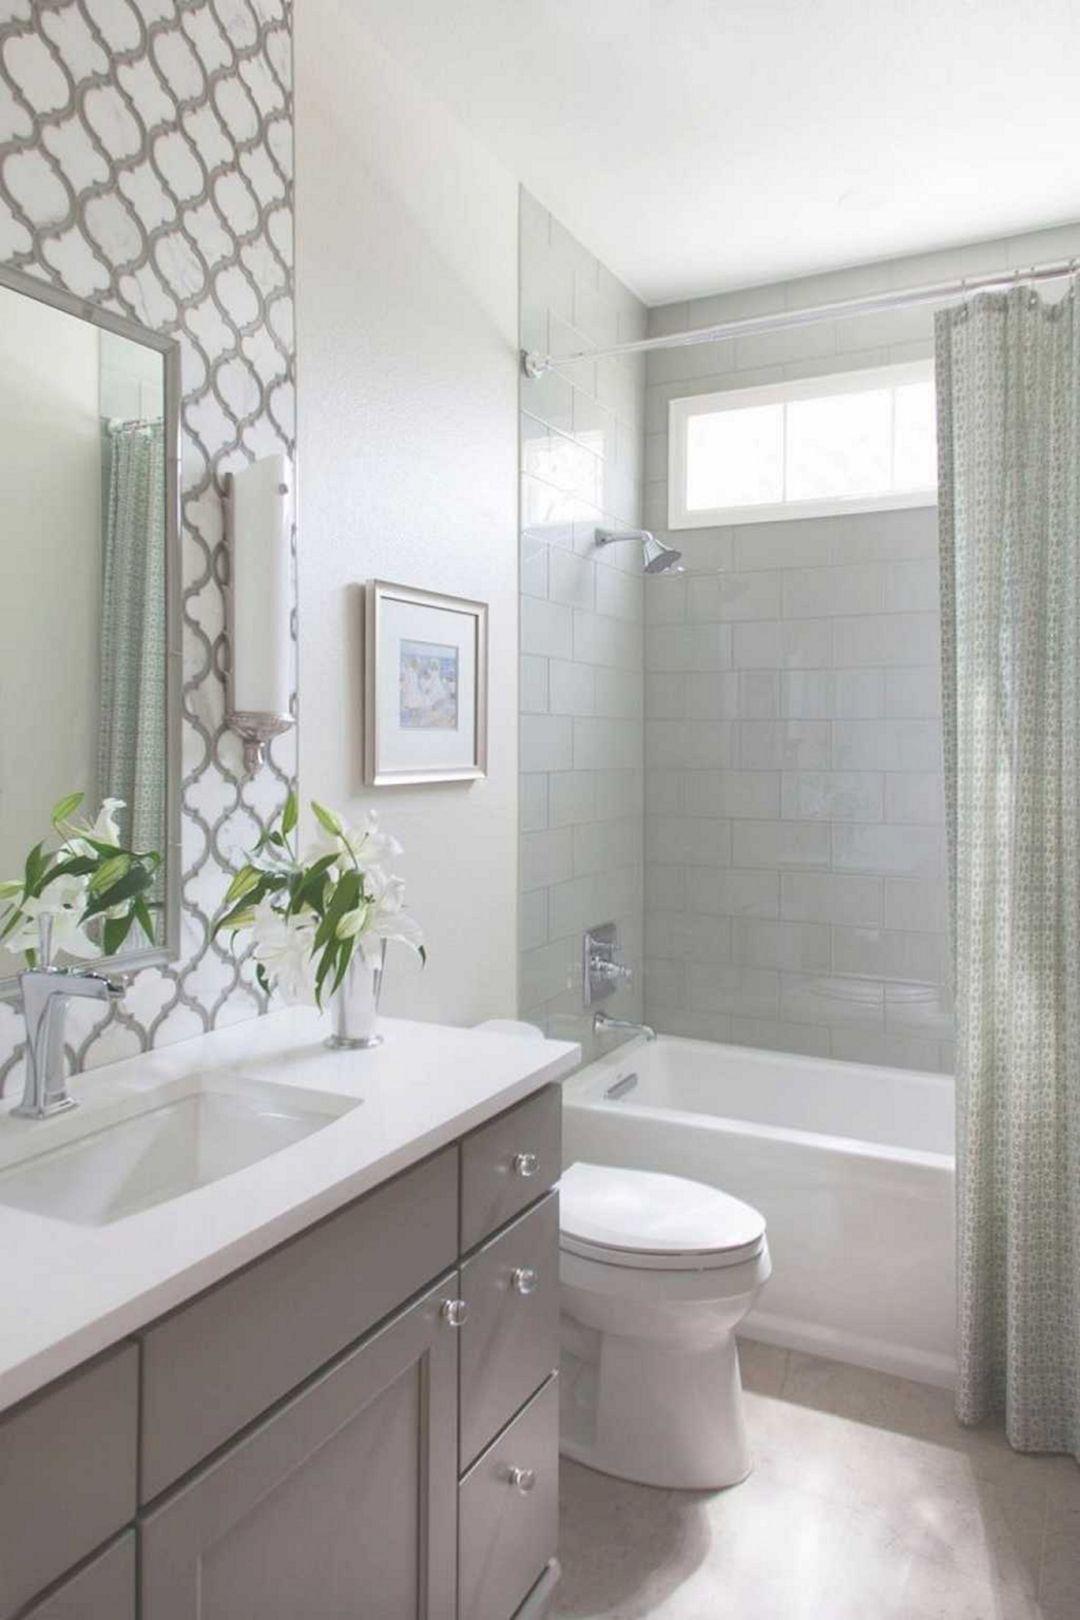 Bathroom Designs Small Space Entrancing 115 Extraordinary Small Bathroom Designs For Small Space  Small Review